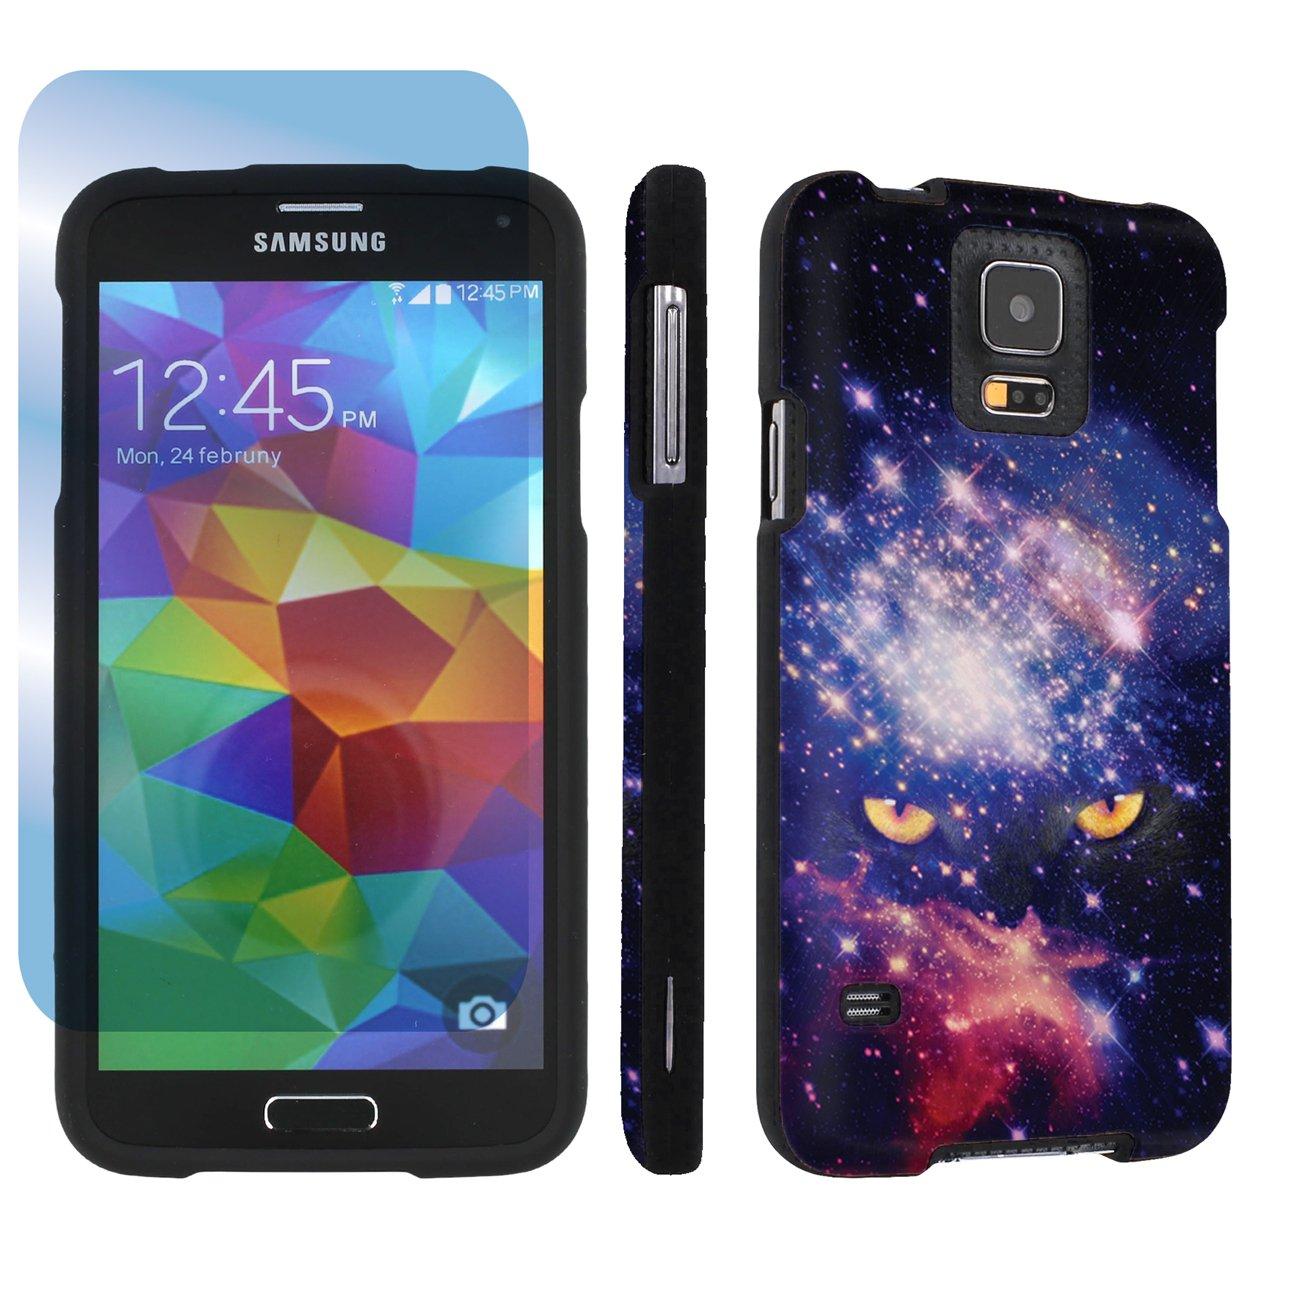 SkinGuardz Samsung Galaxy S5 Hard Protection Case + Screen Protector - (Space Cat Black)